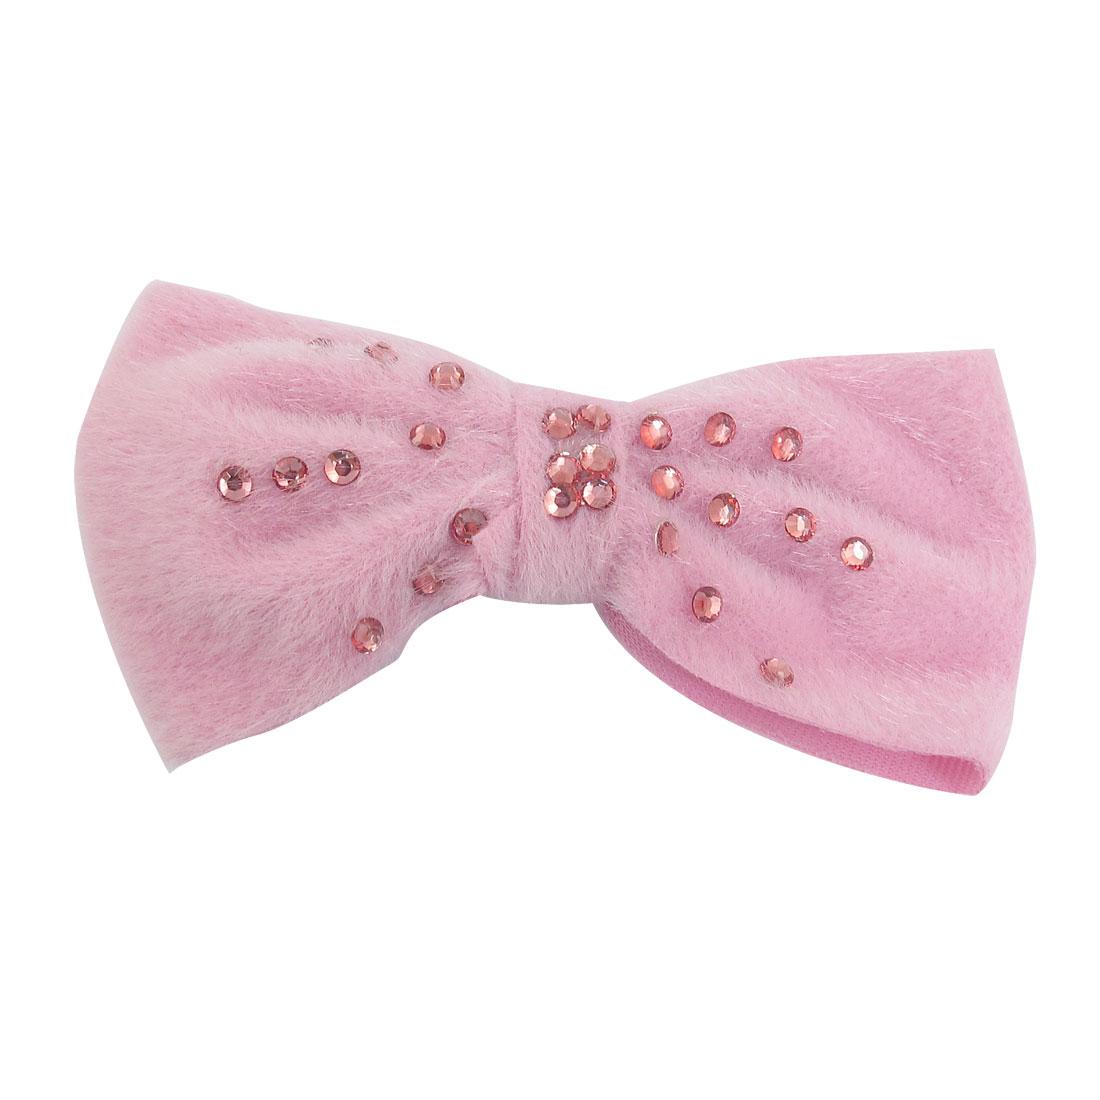 Pink Plush Bowknot Shape Plastic Rhinestone Decor Alligator Barrette Hairclip